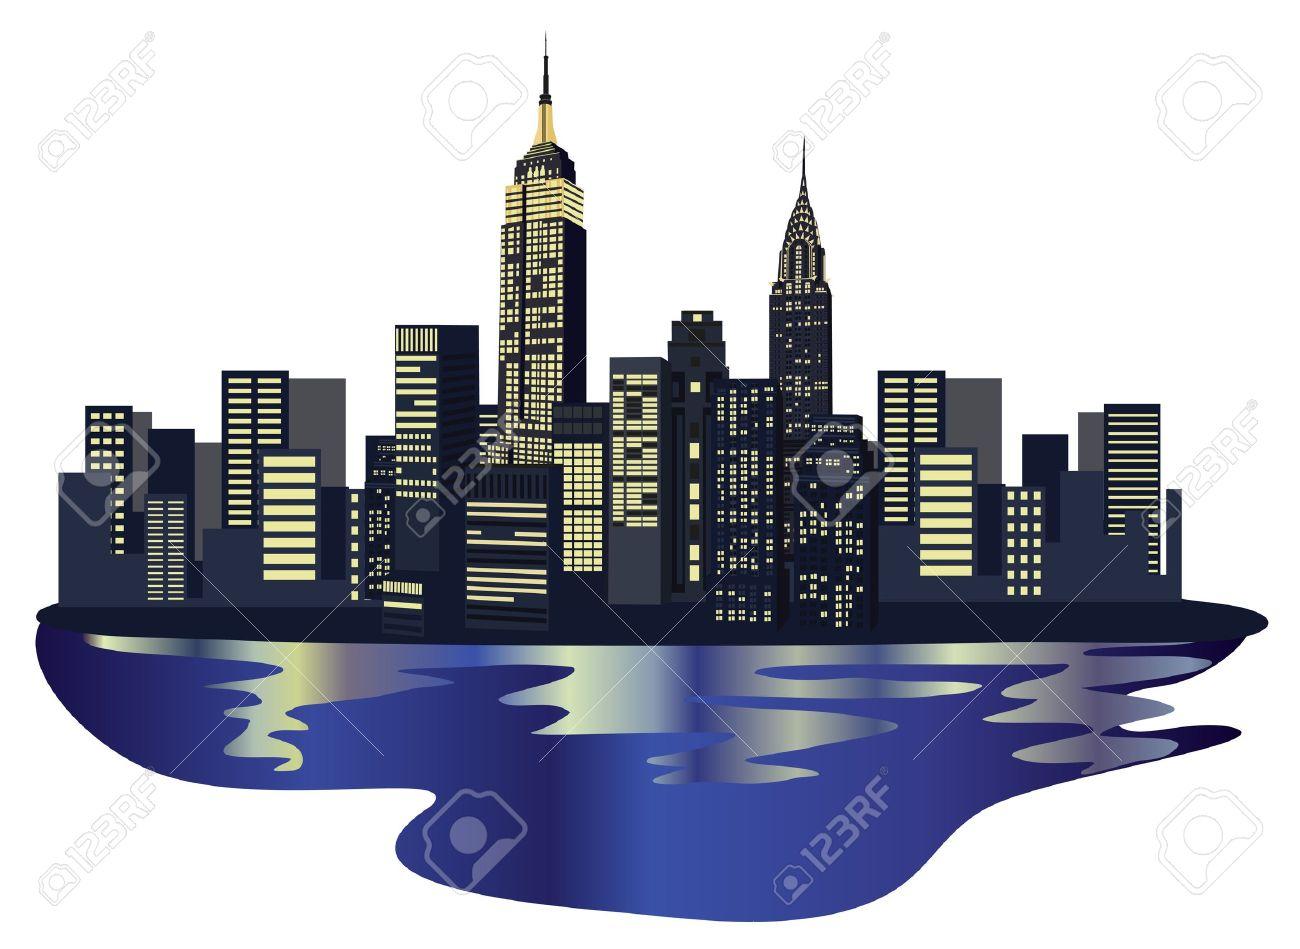 new york skyline: Illustration .-new york skyline: Illustration .-16